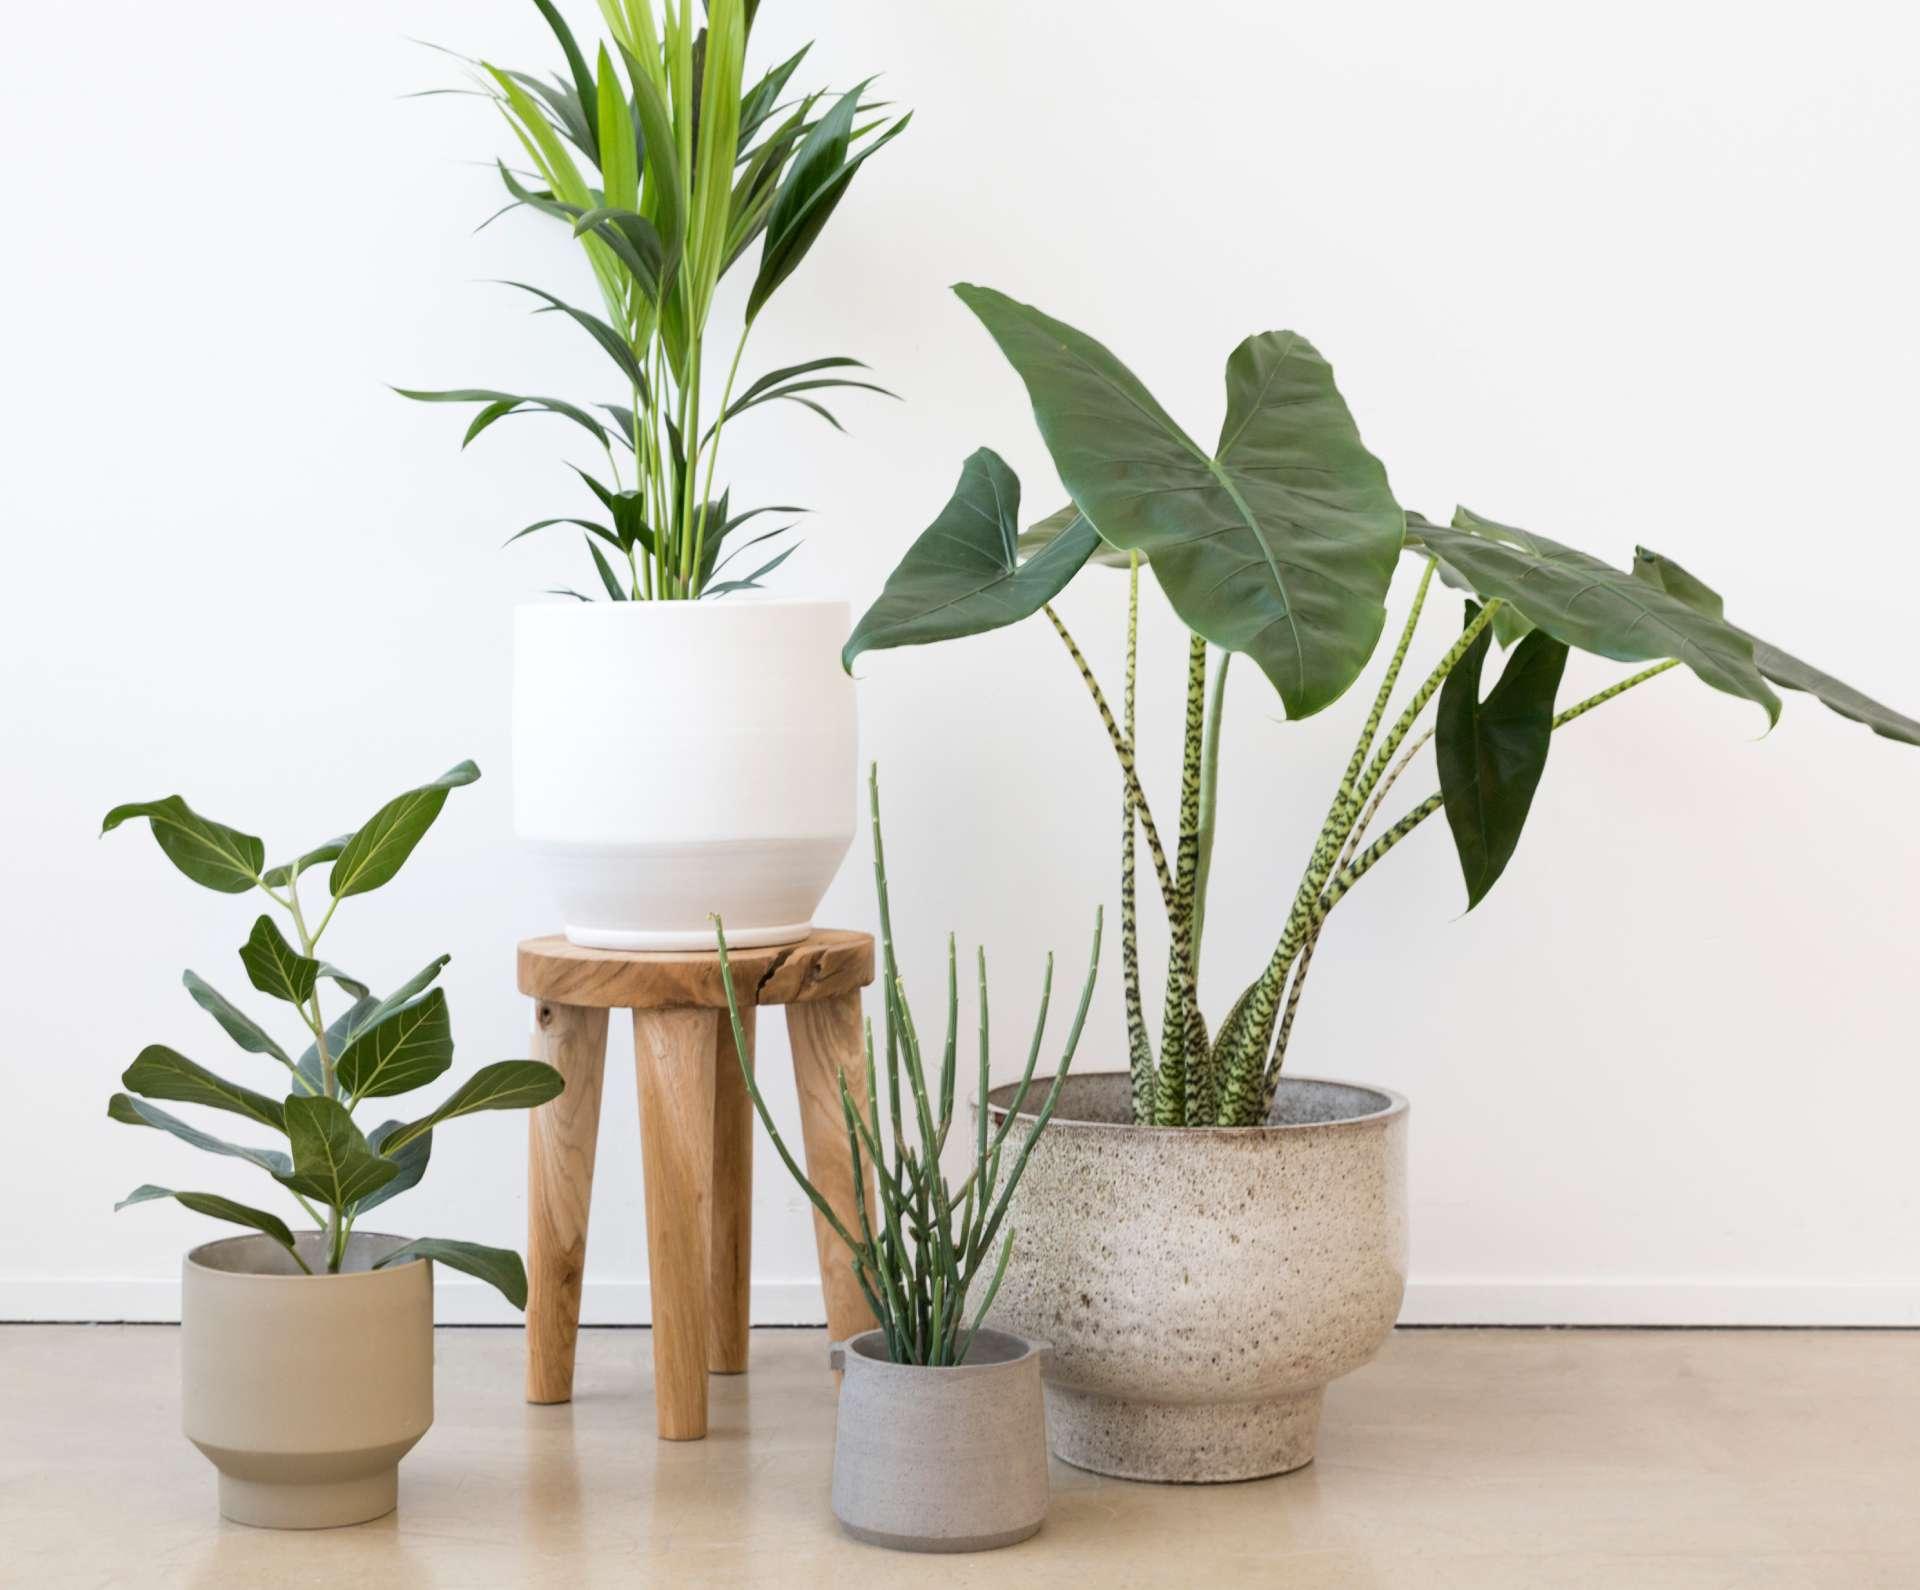 Bekend Plantenpotten - Loods 5 IU48